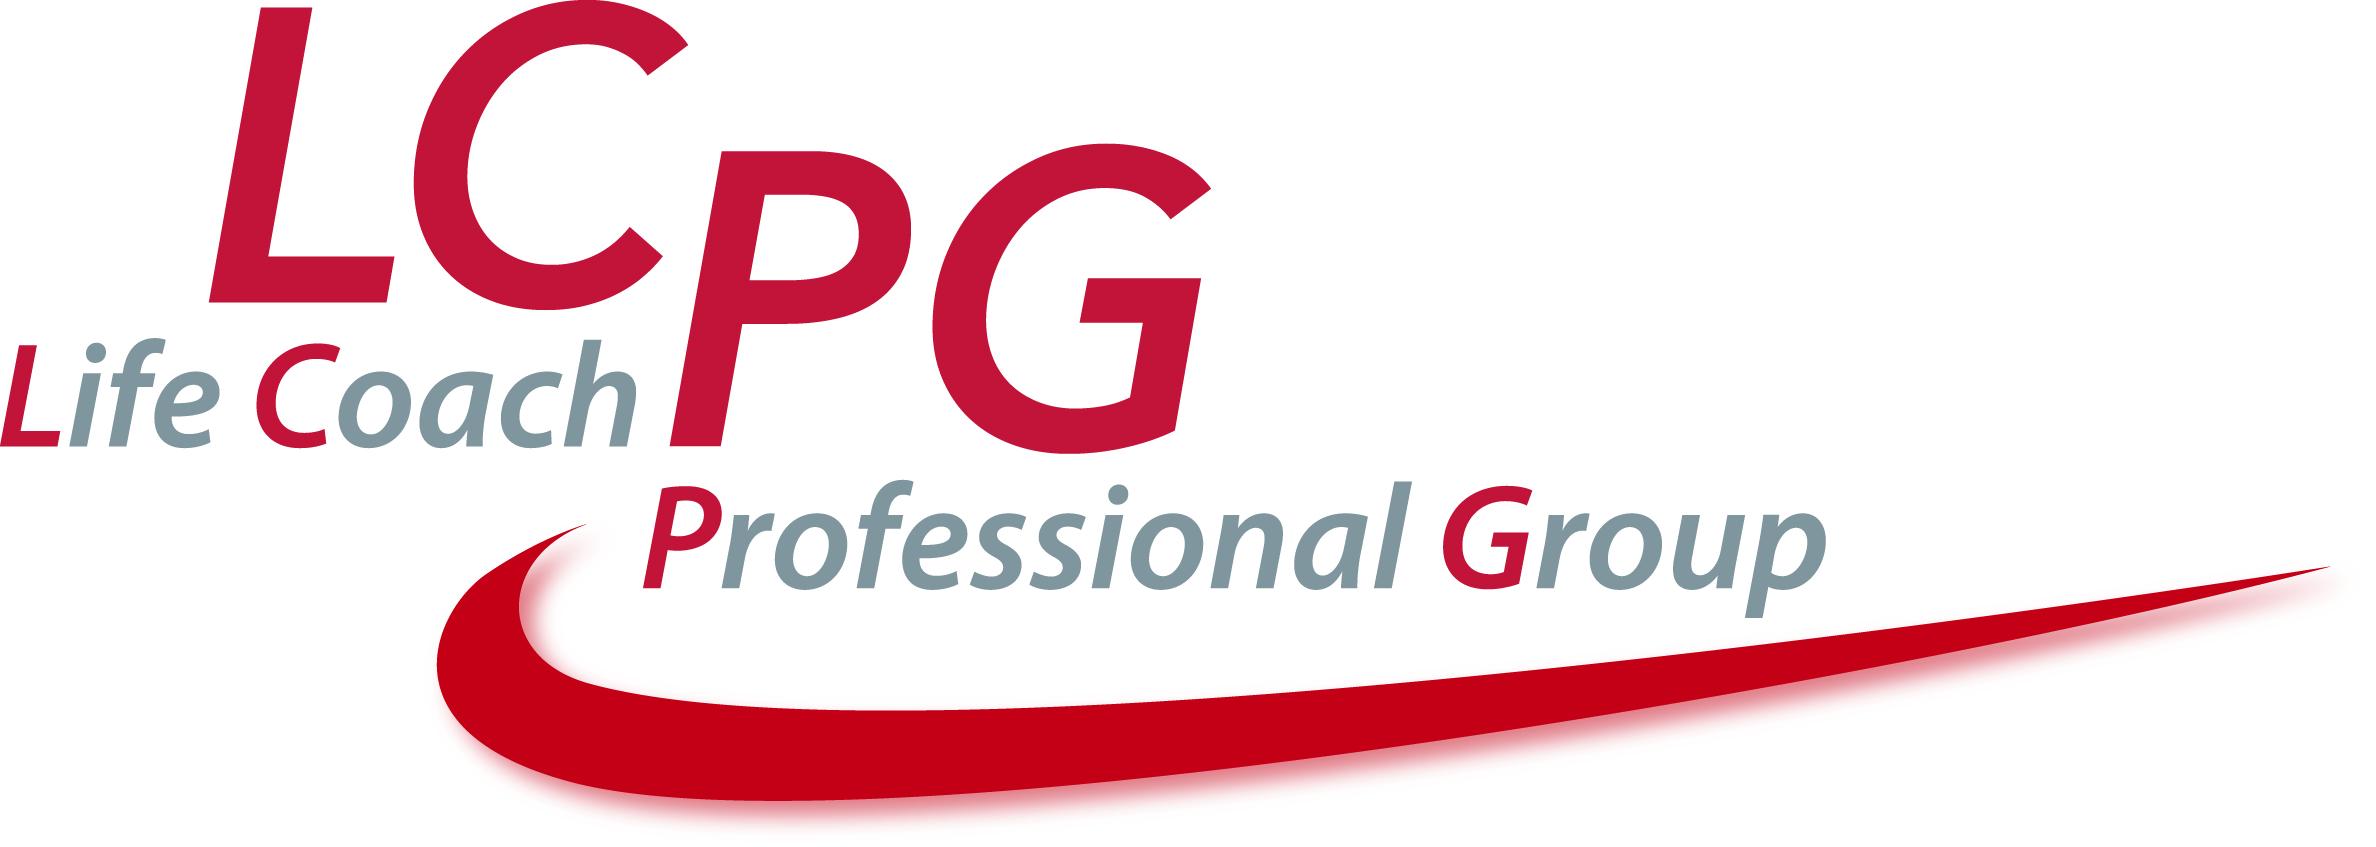 Logo-LCPG-FC